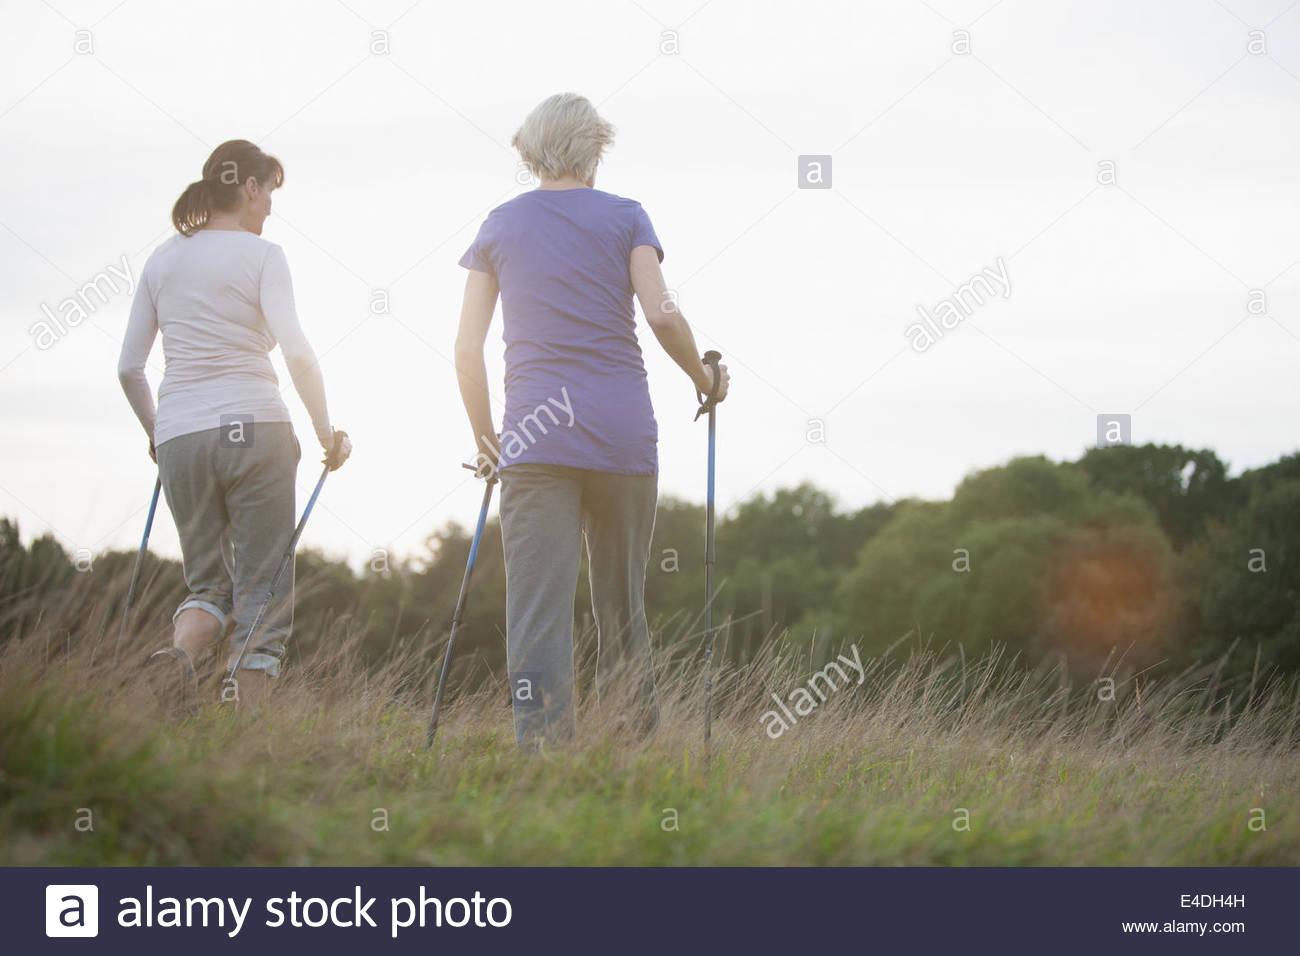 Les femmes ensemble en plein air randonnée Photo Stock